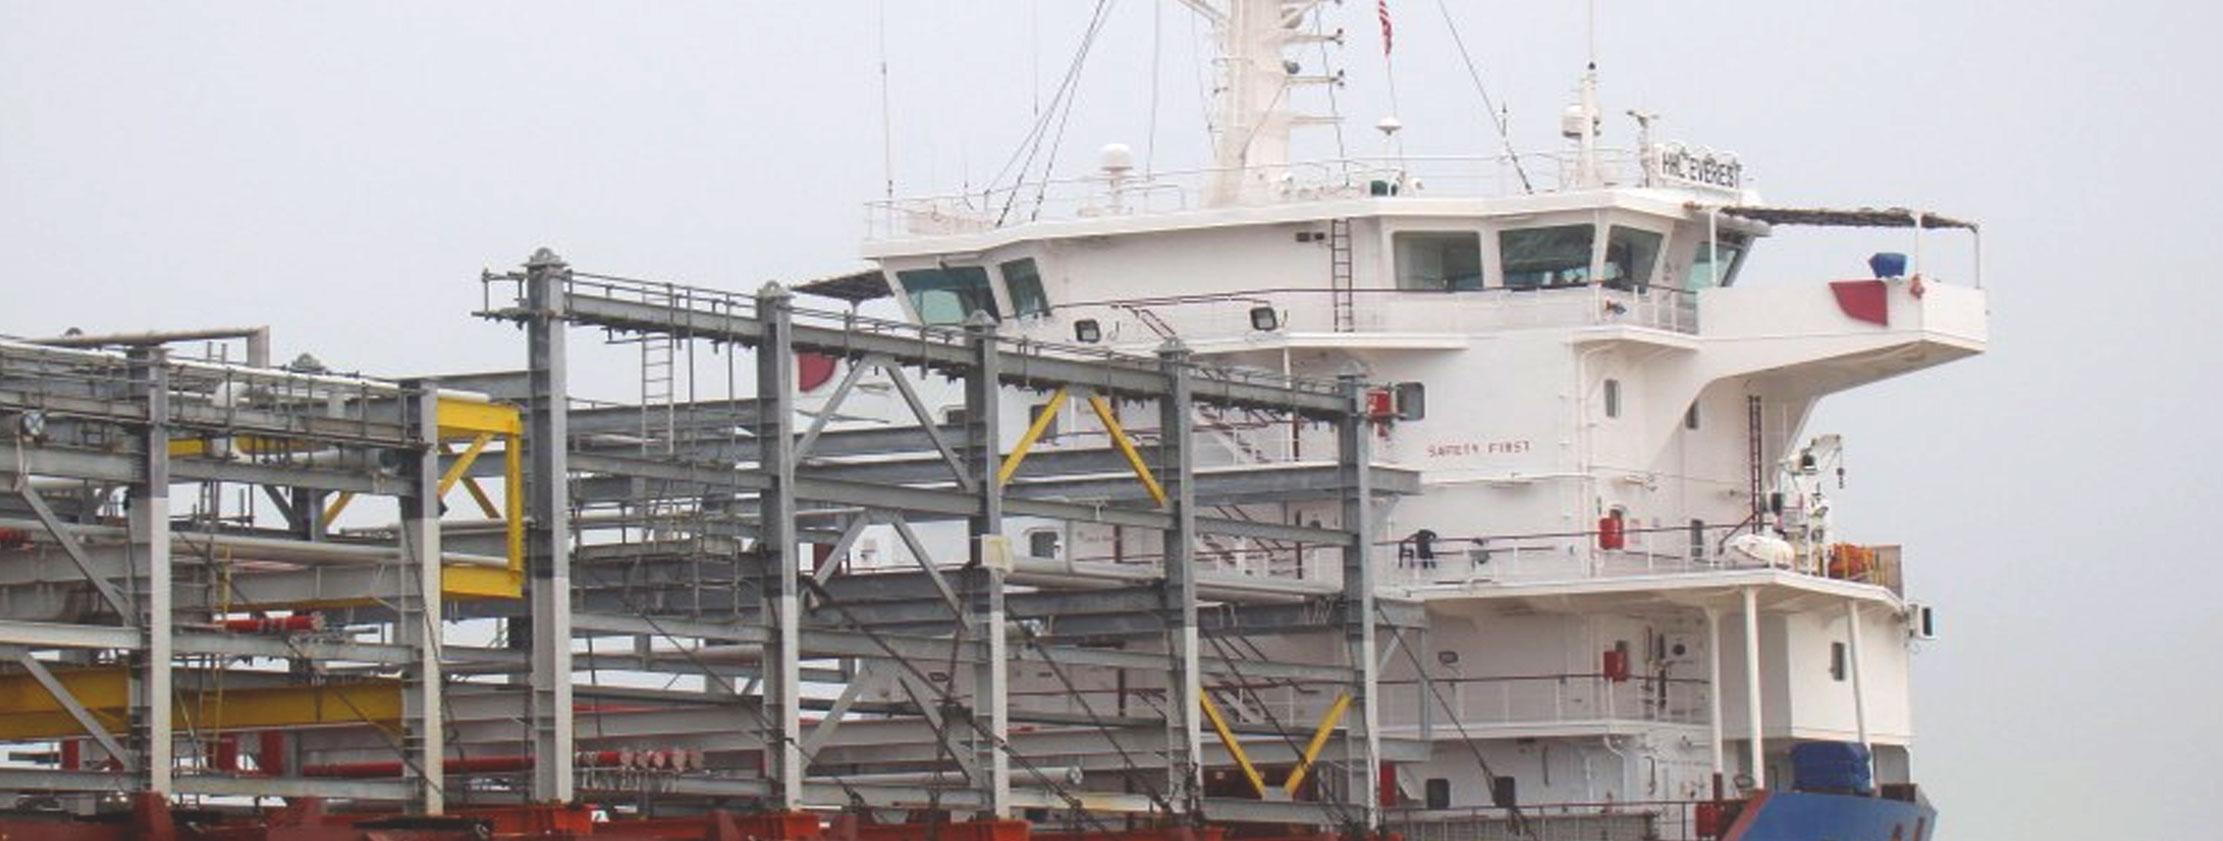 custom project cargo tranport